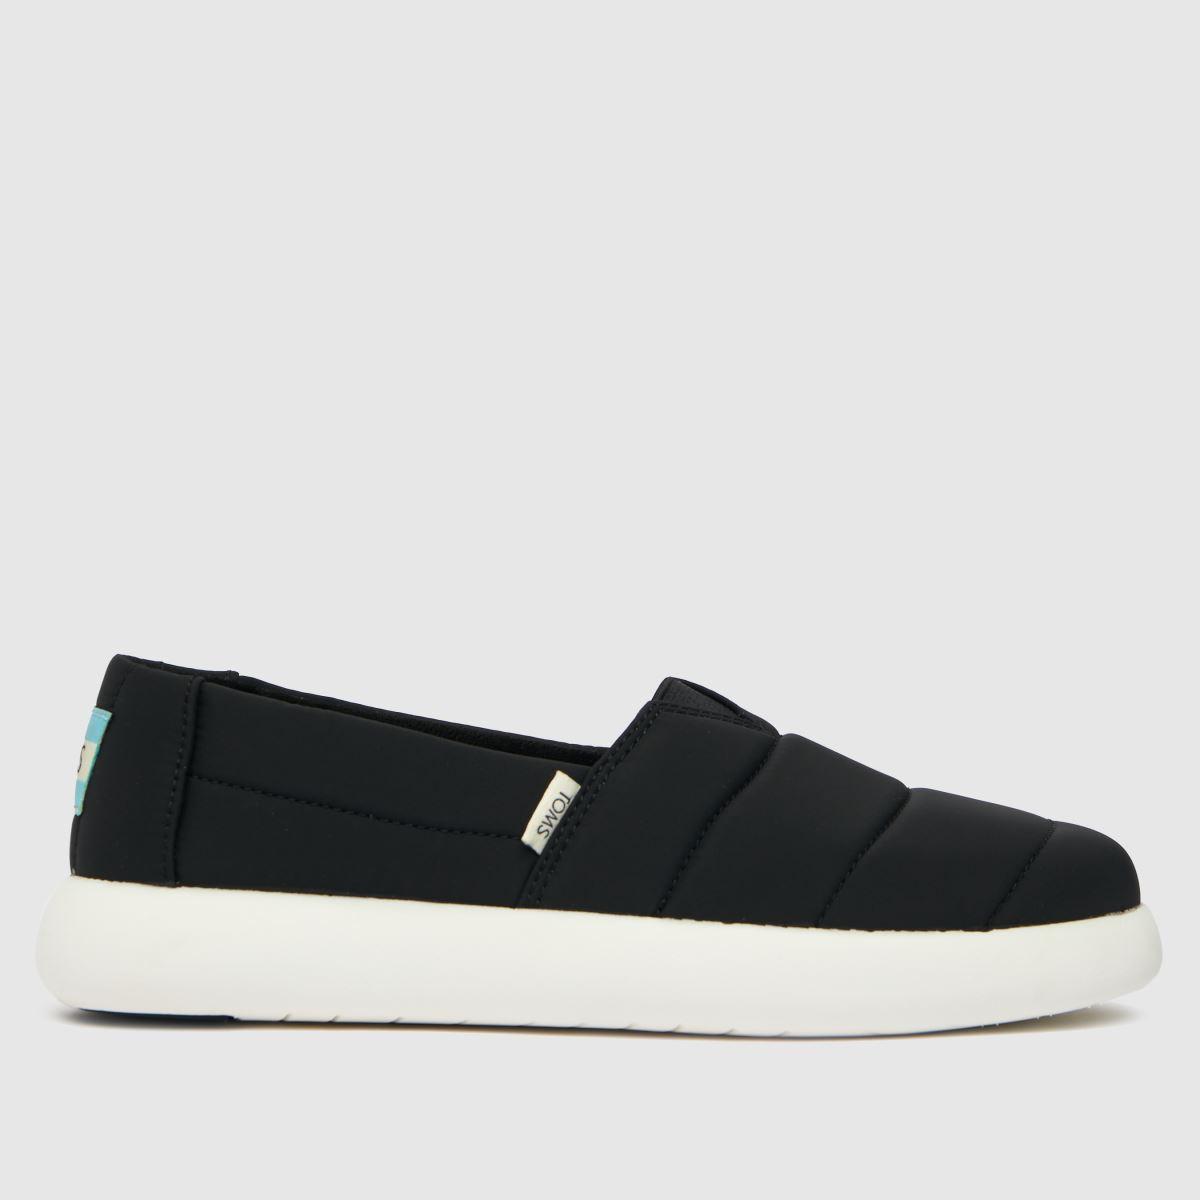 TOMS Black Alpargata Mallow Vegan Flat Shoes